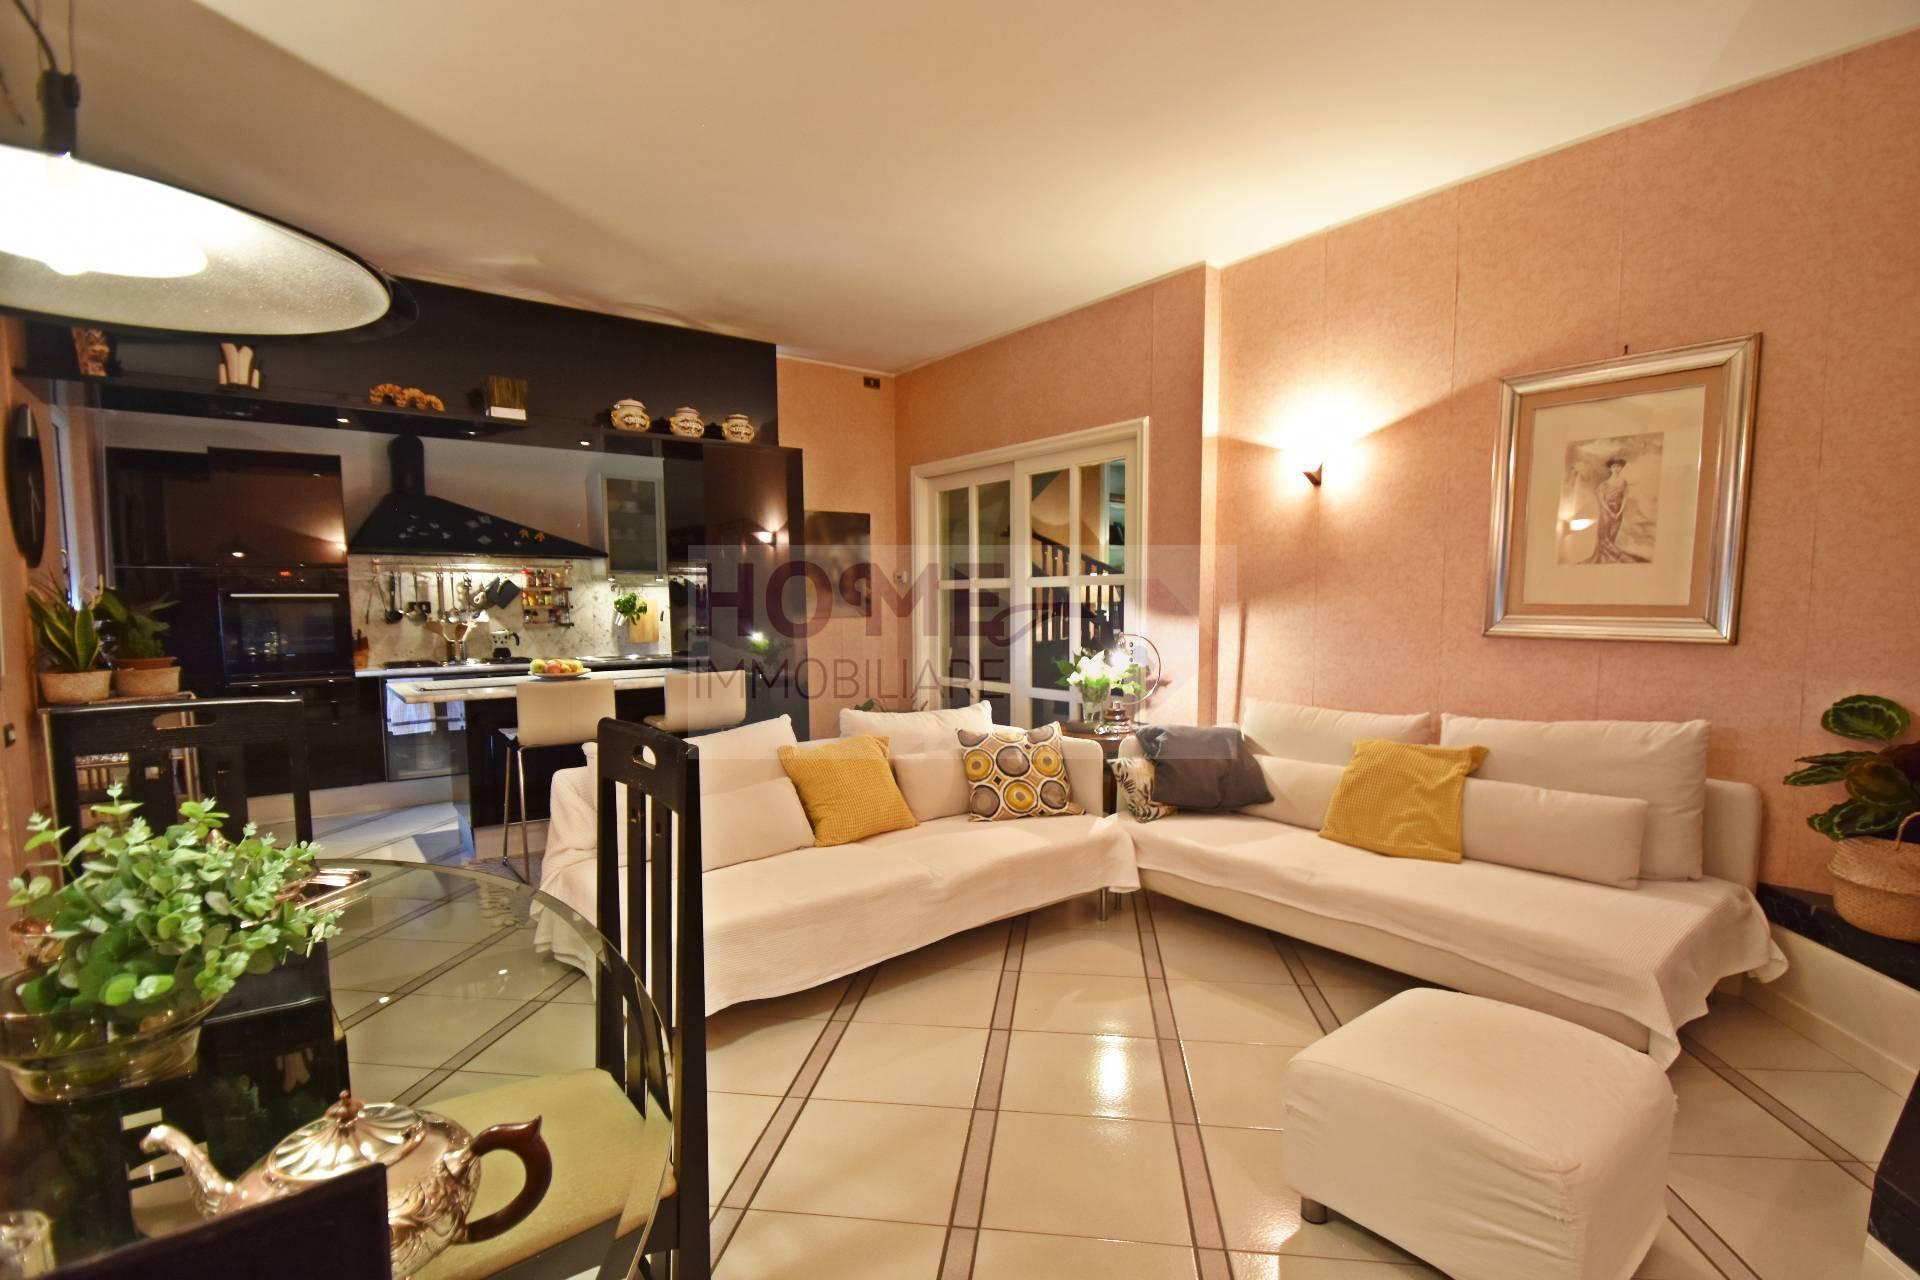 villa casa vendita macerata di metri quadrati 200